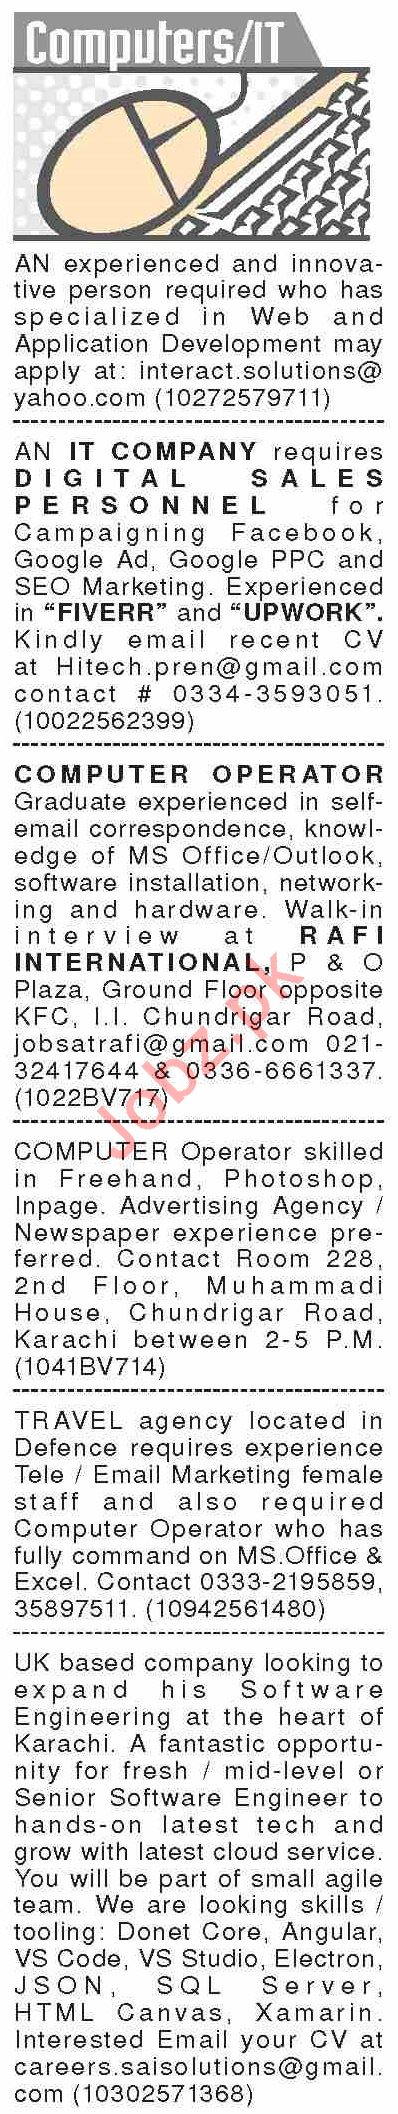 Dawn Sunday Classified Ads 9 Feb 2020 for IT Staff